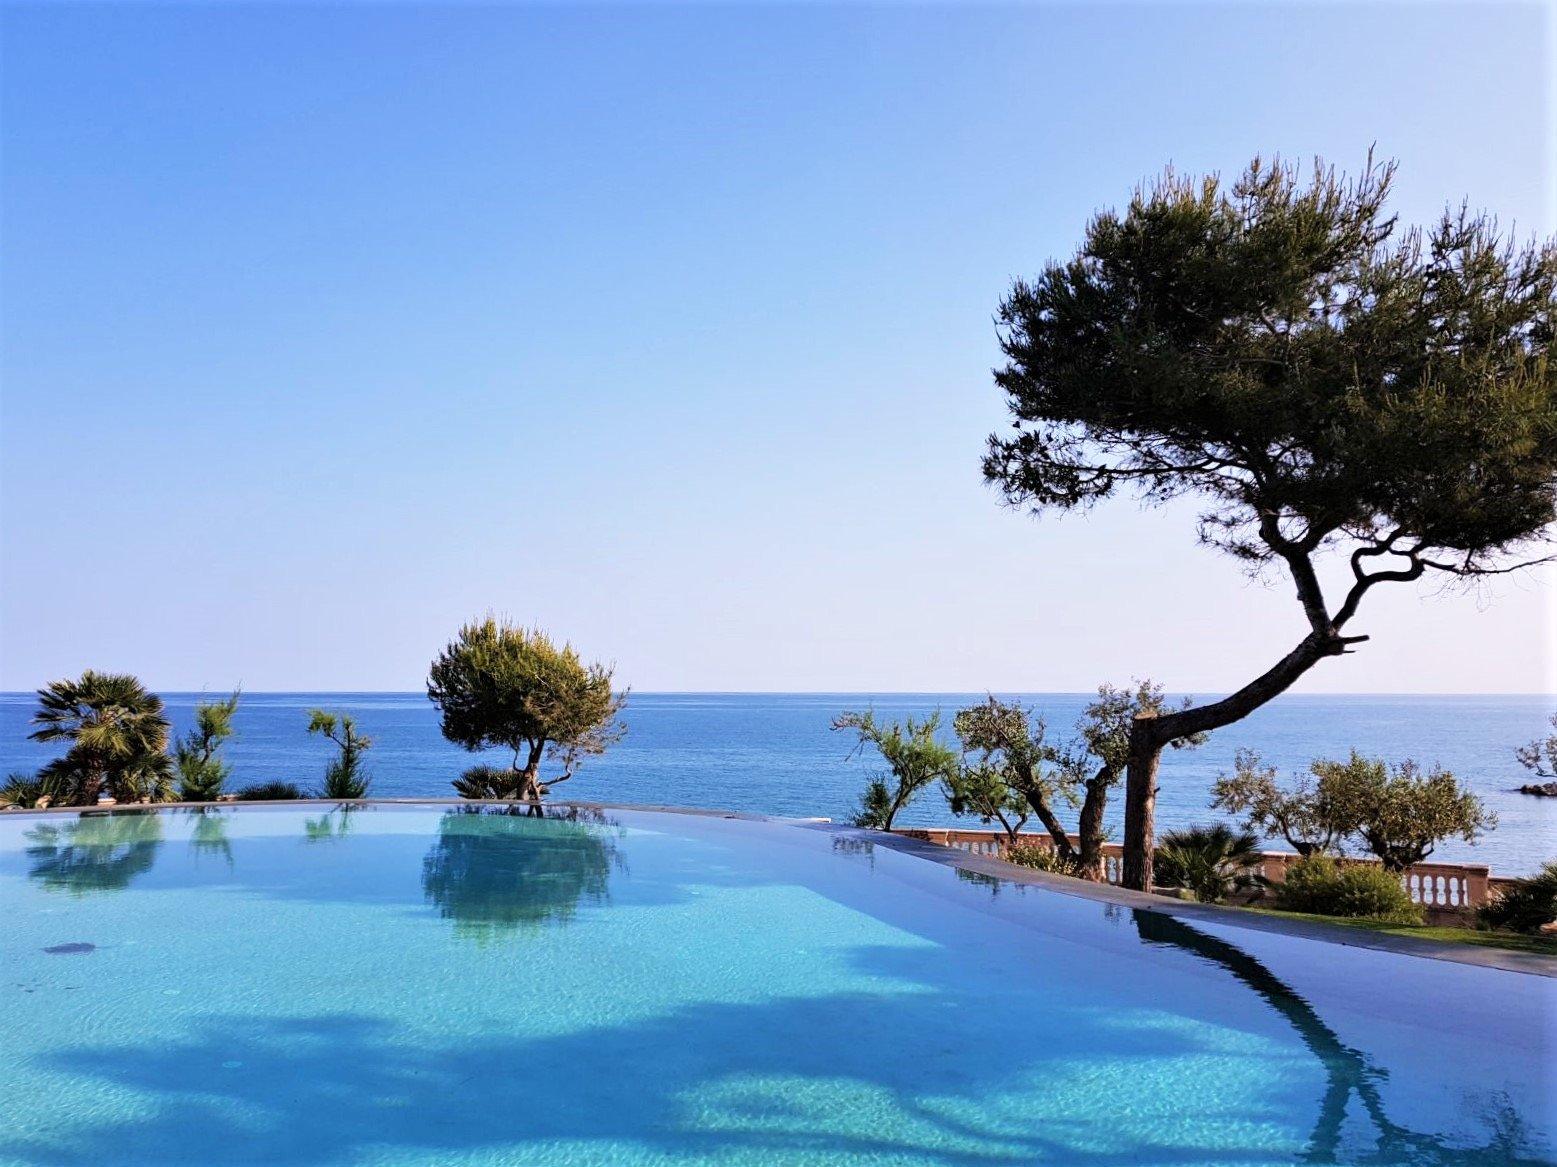 Piscina infinita frente al mar Xalet del Nin